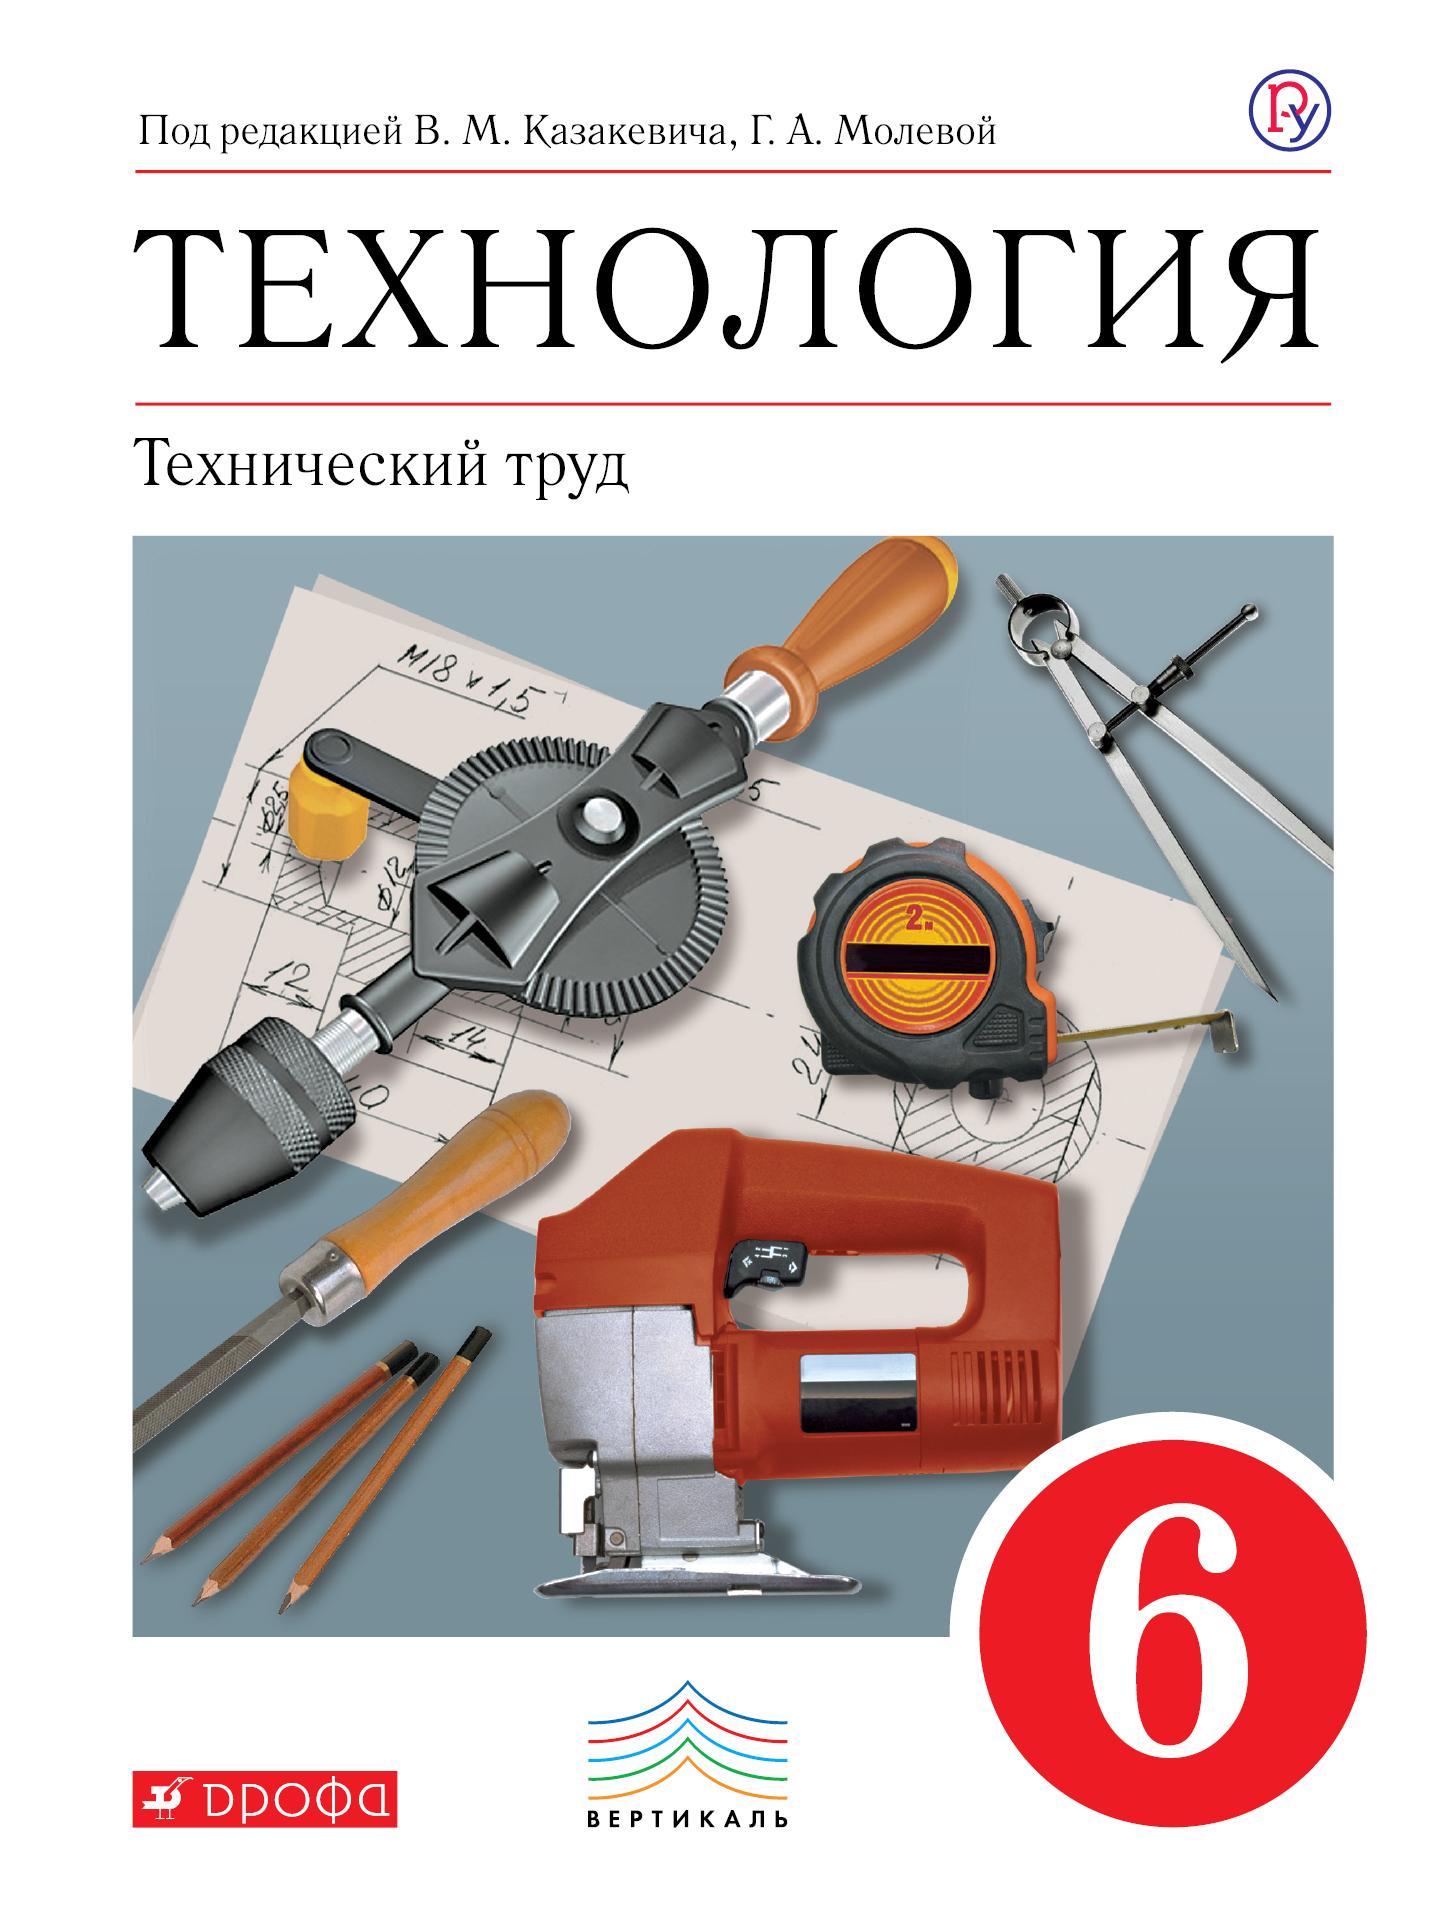 Технология. Технический труд. 6 кл . Учебник. ВЕРТИКАЛЬ